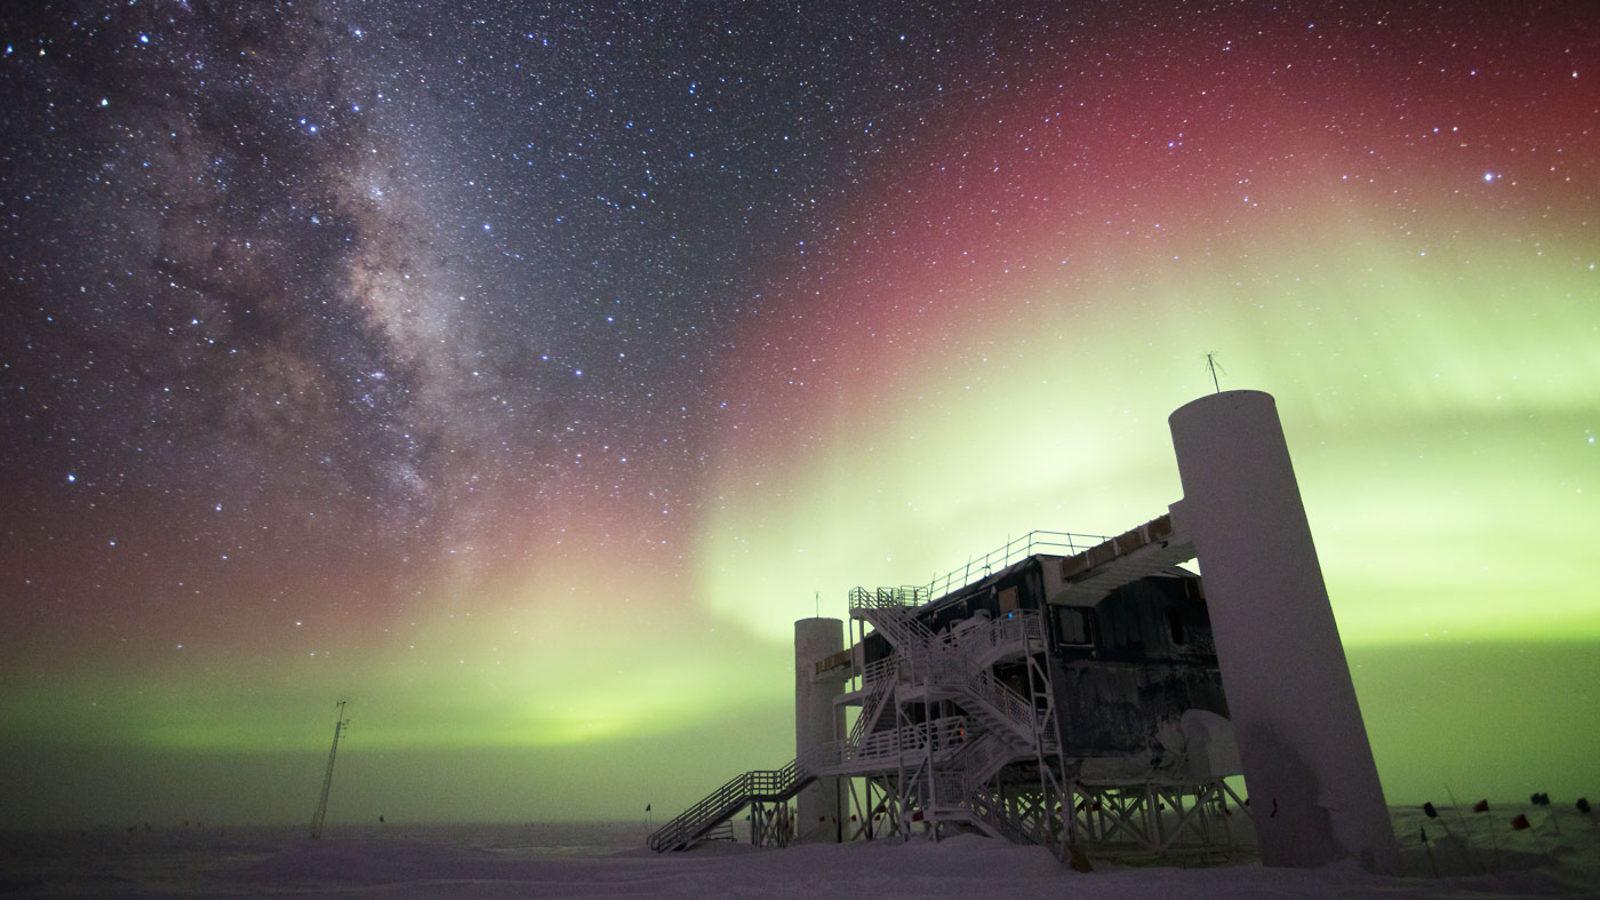 IceCube sees highest-energy neutrino ever found | symmetry ... Icecube Neutrino Observatory